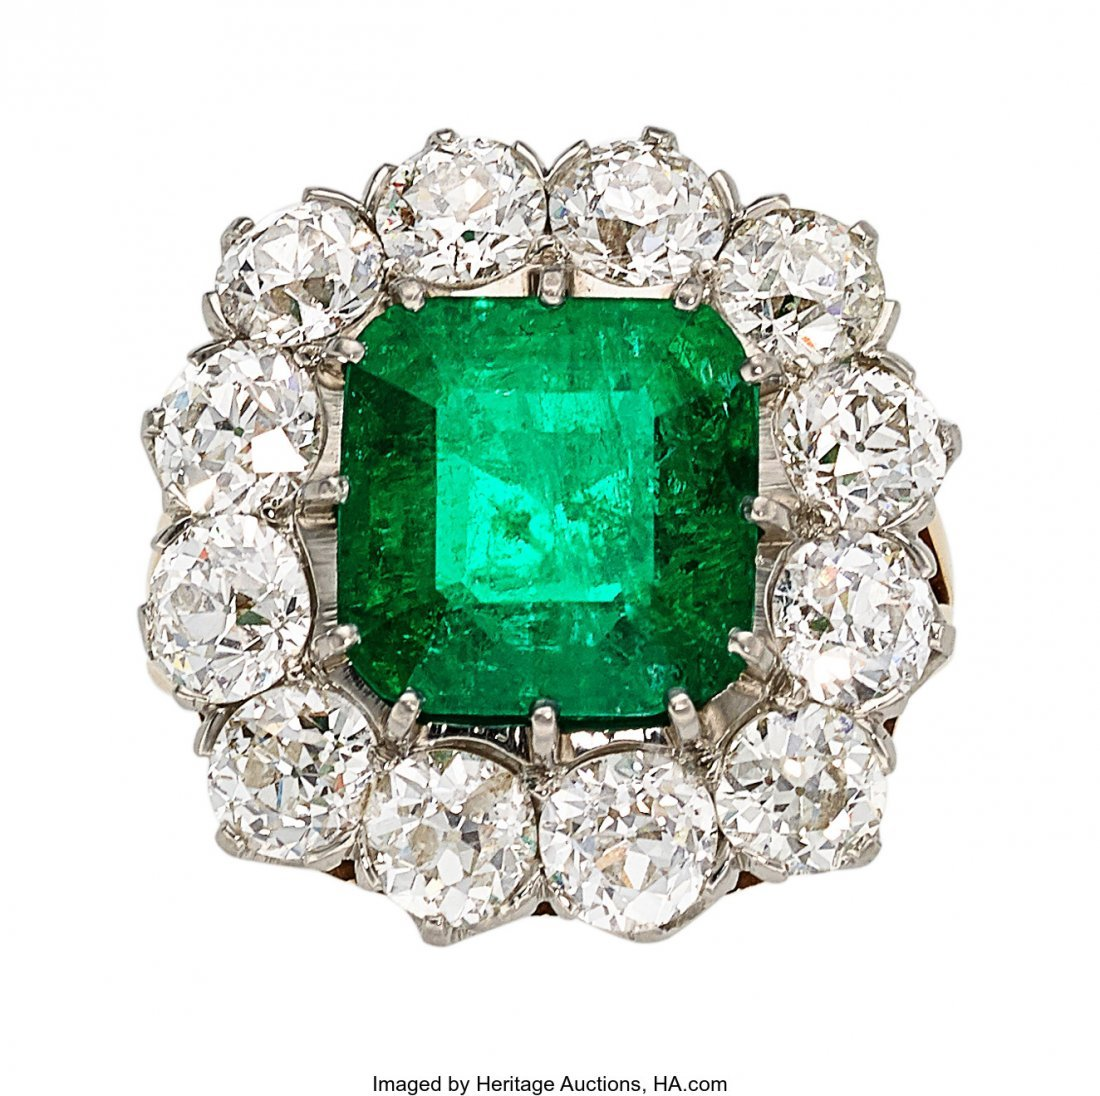 55205: Colombian Emerald, Diamond, Platinum, Gold Ring